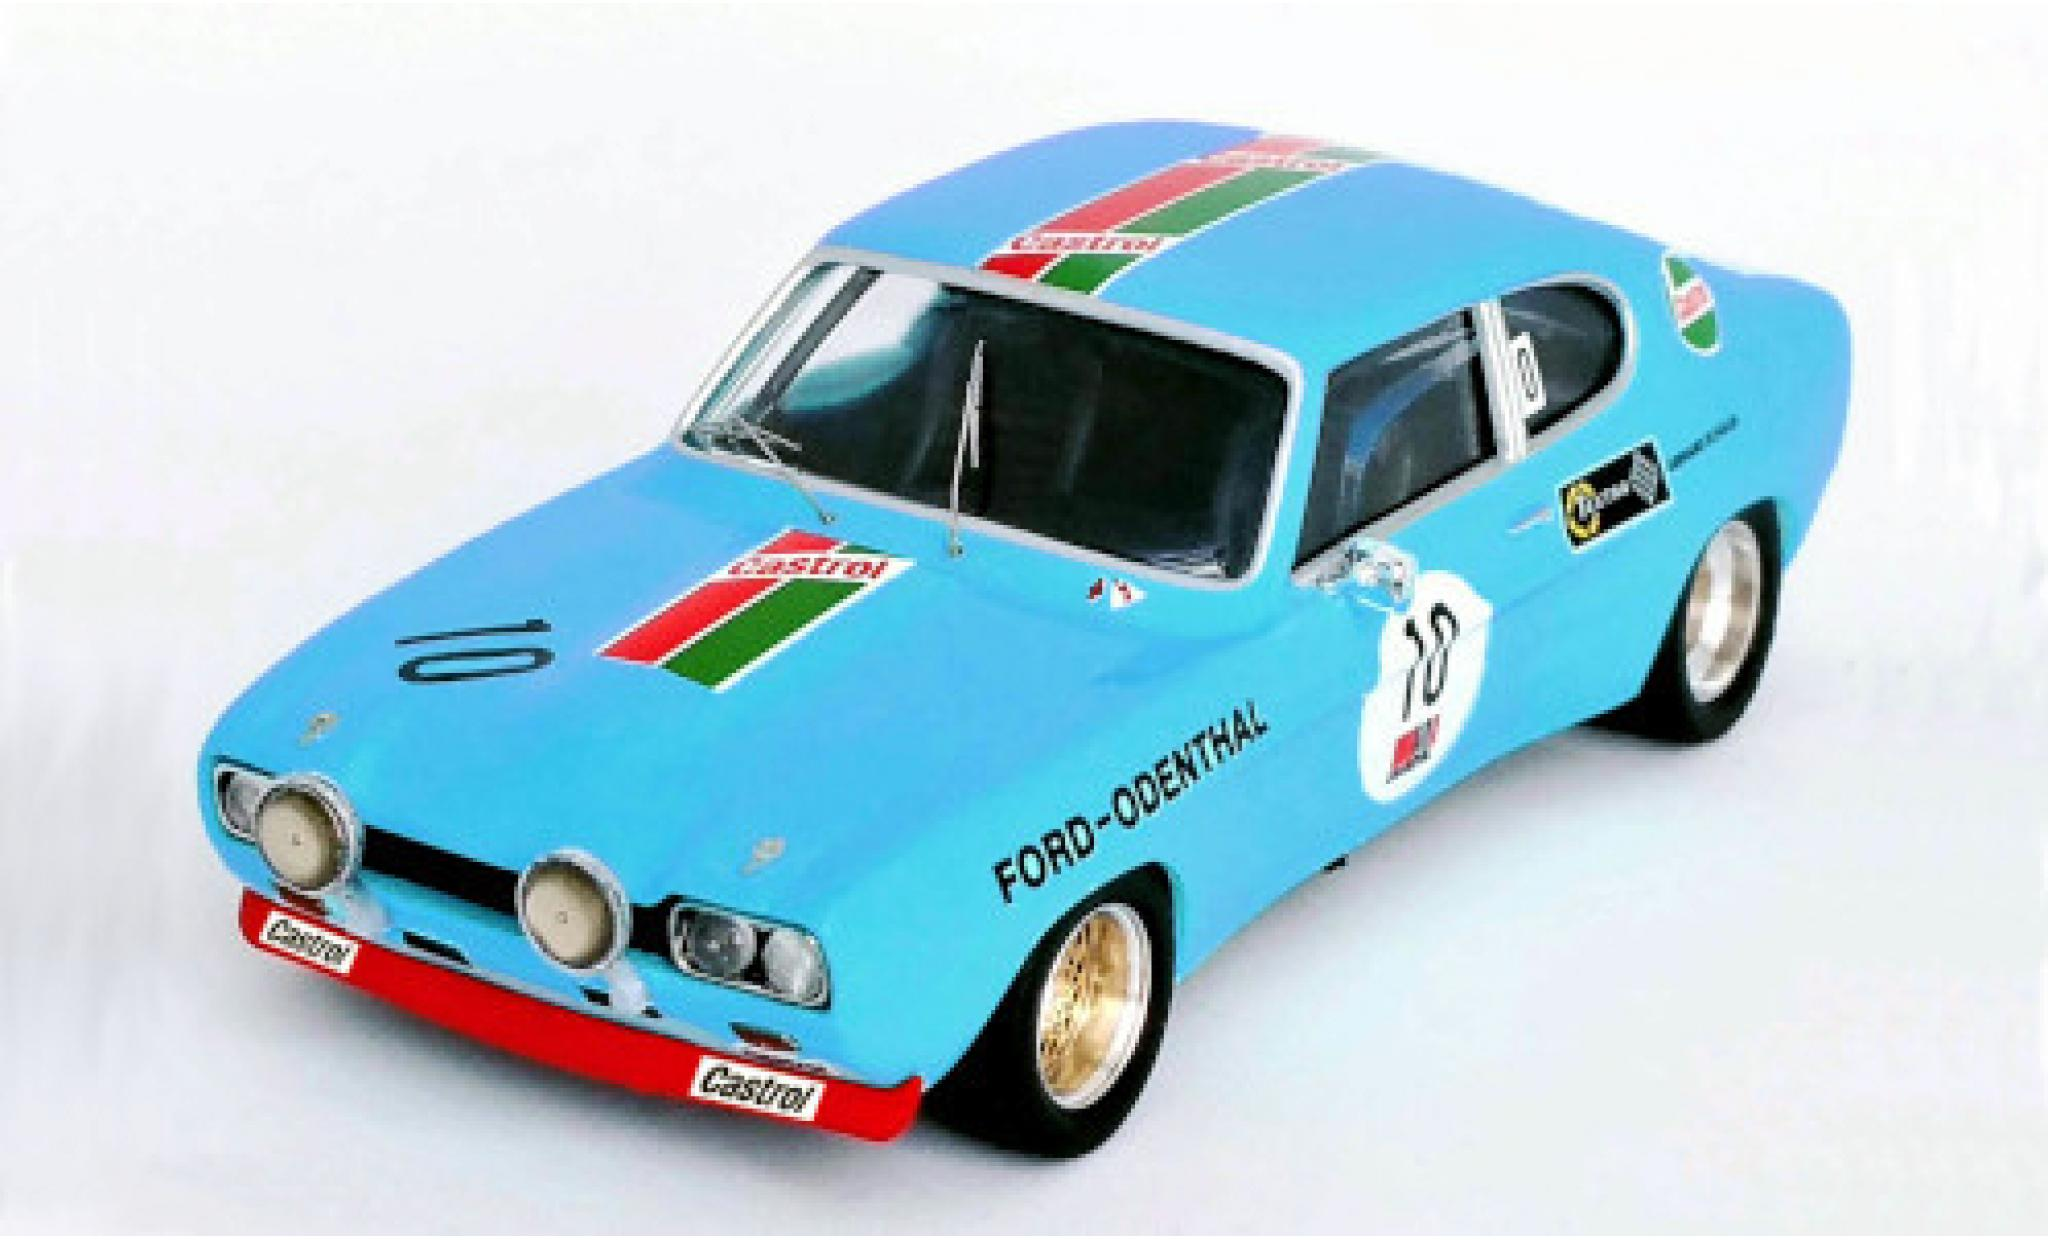 Ford Capri 1/43 Trofeu MkI RS 2600 No.10 -Odenthal 24h Nürburgring 1972 W.Odenthal/G.Schüler